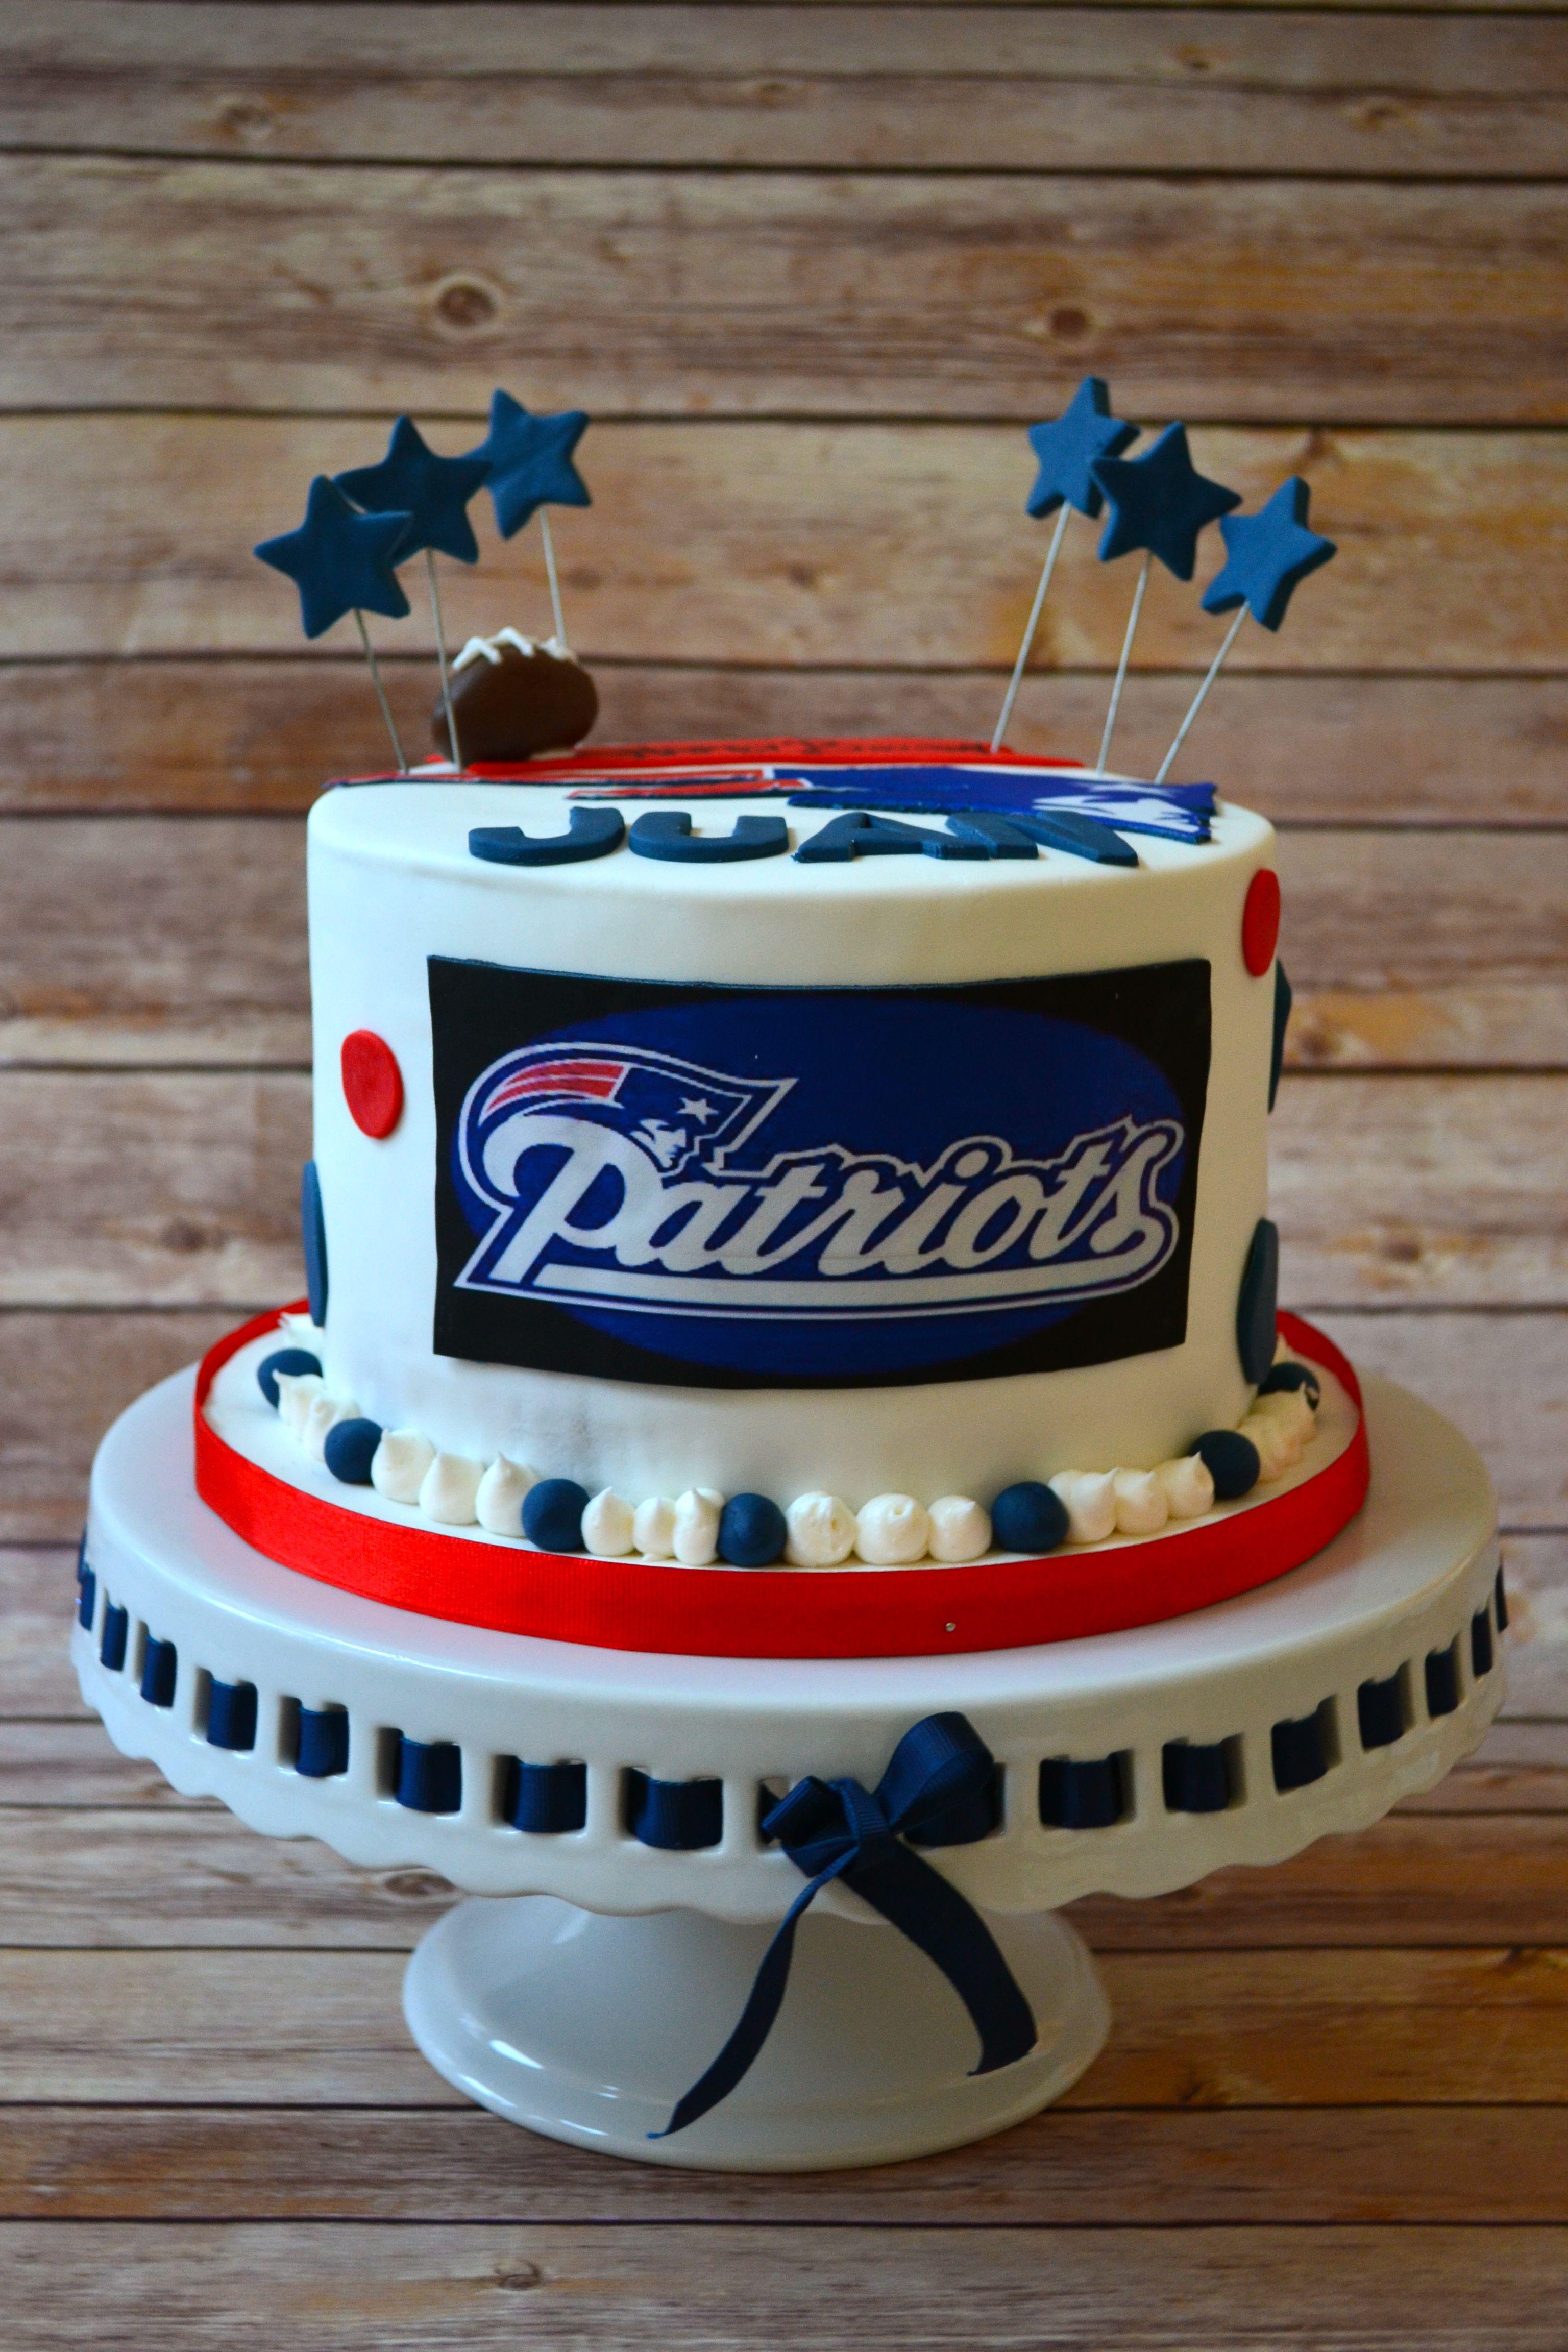 New England Patriots Cake Via Https Www Facebook Com Alittlecakeshop Patriotic Cake Grooms Cake Cake